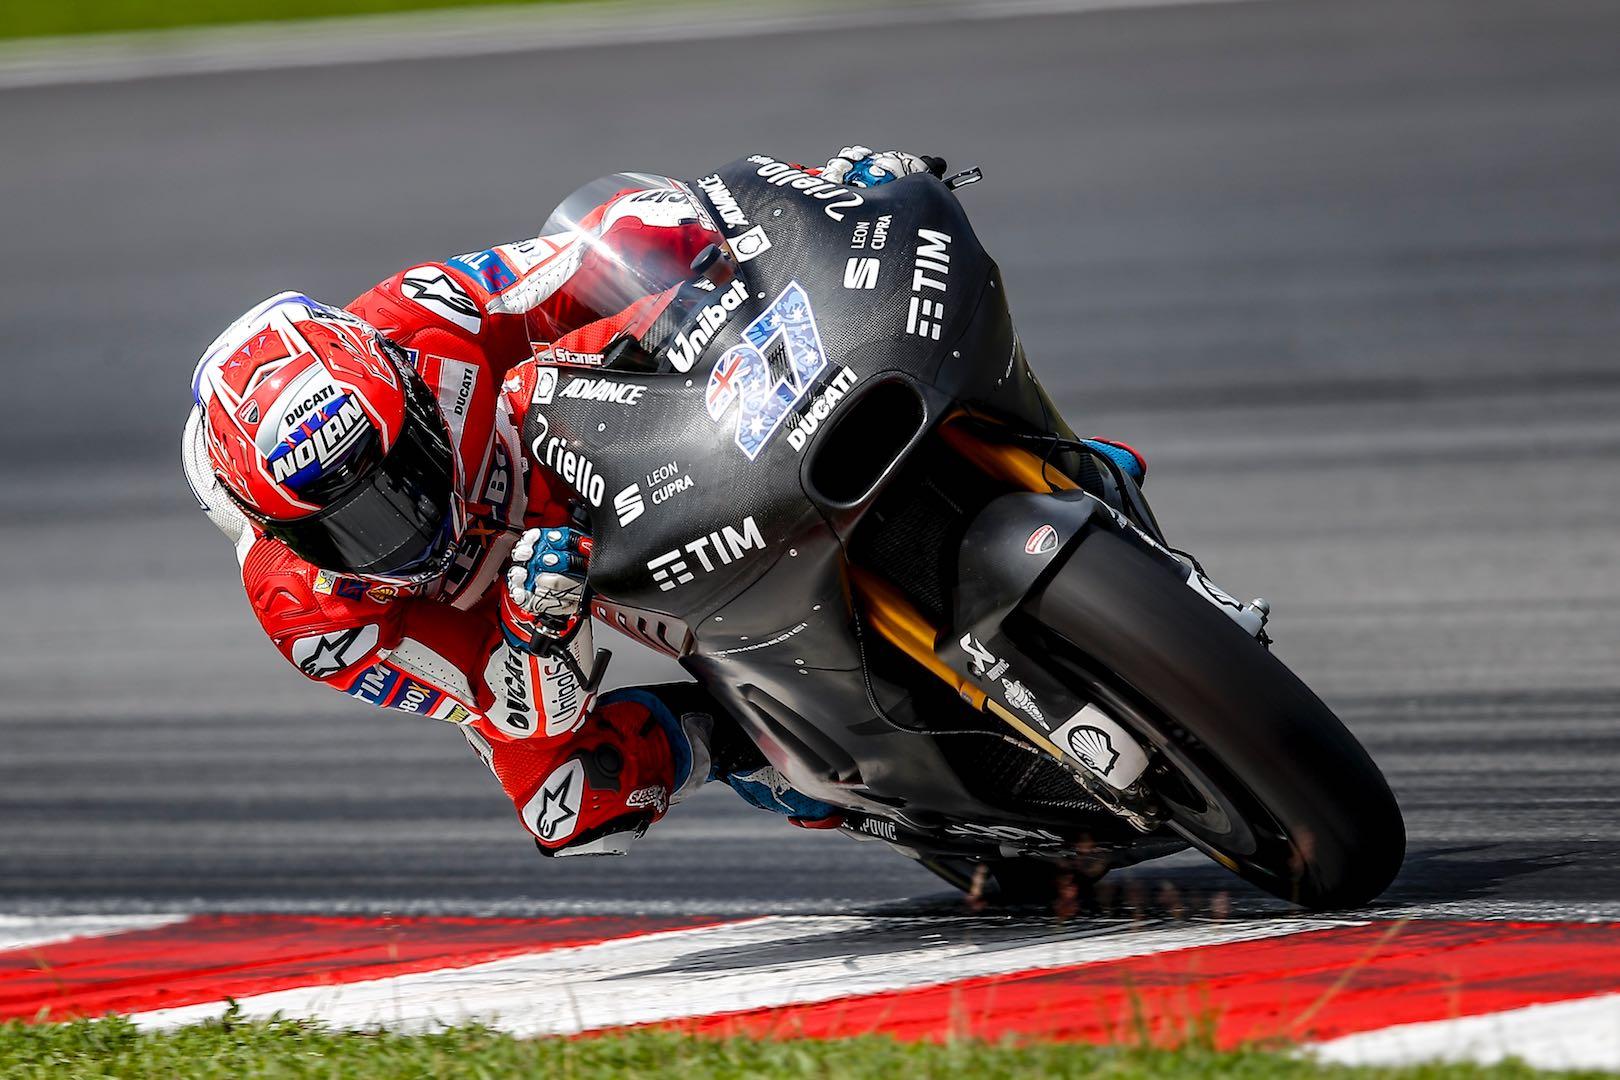 Ducati Test Rider Stoner Tops 1st Official 2017 MotoGP Test, Day 1